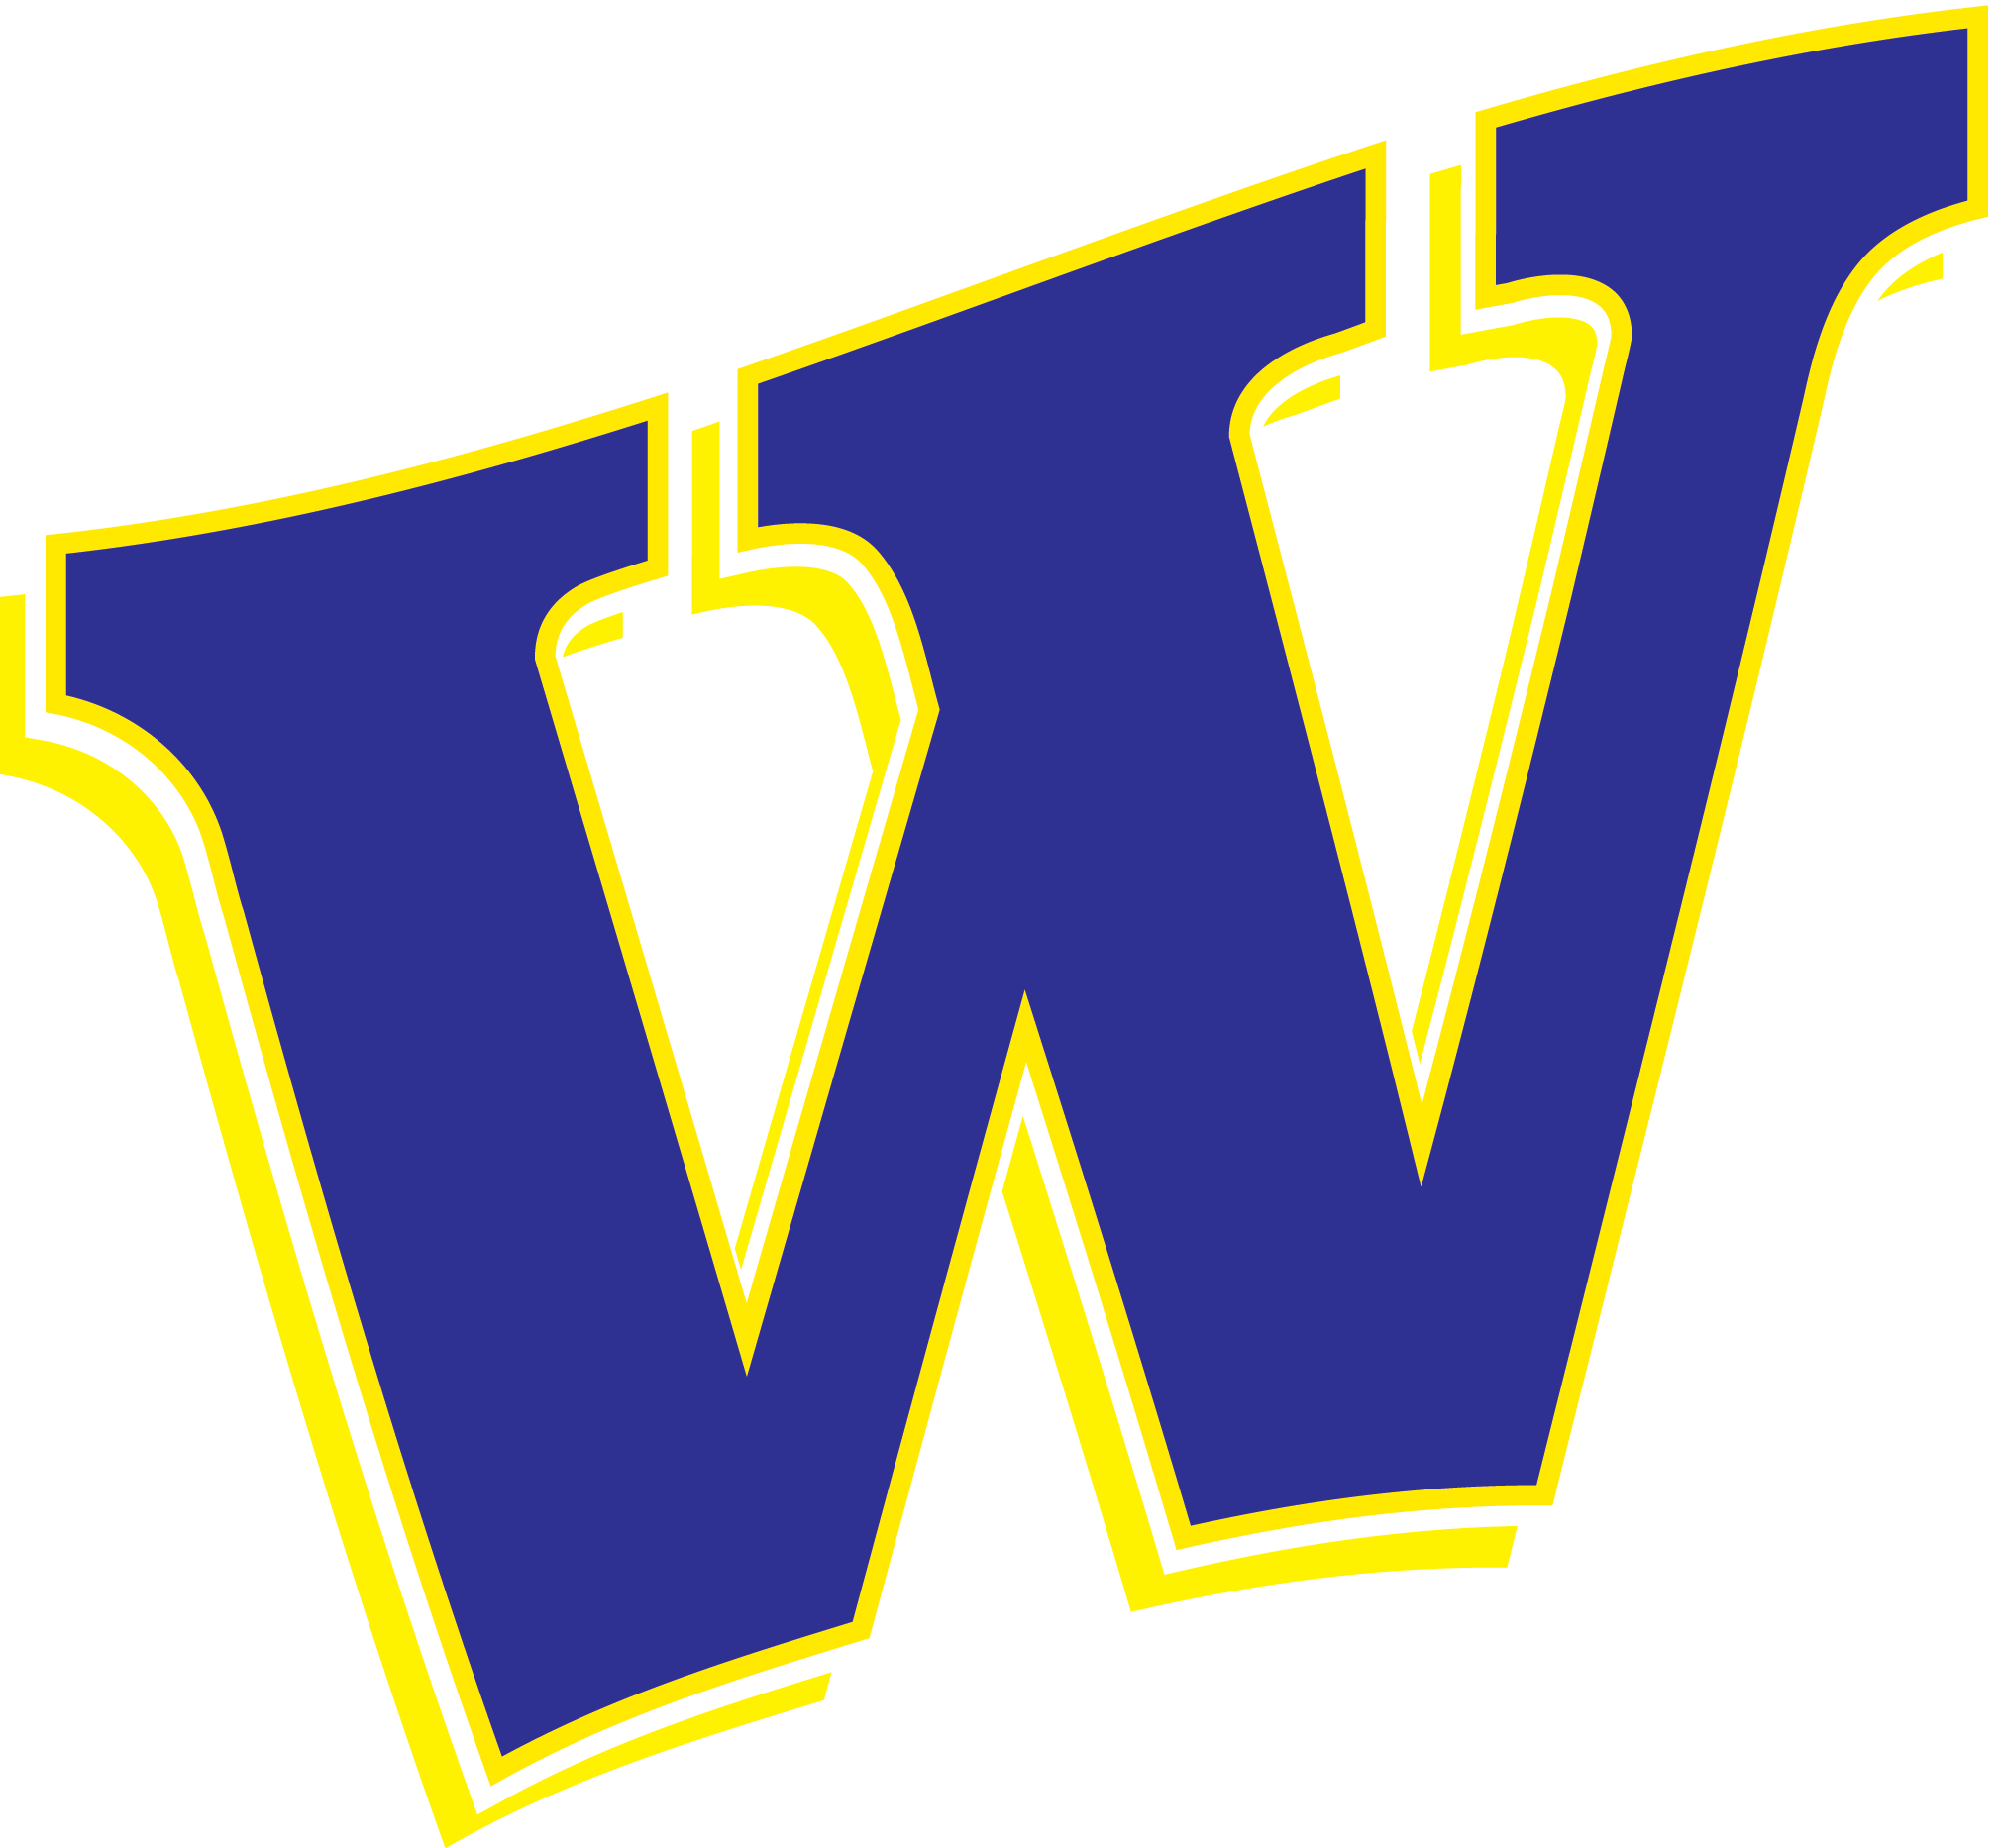 High school dance team clipart banner royalty free download West High School Athletics | West High School banner royalty free download